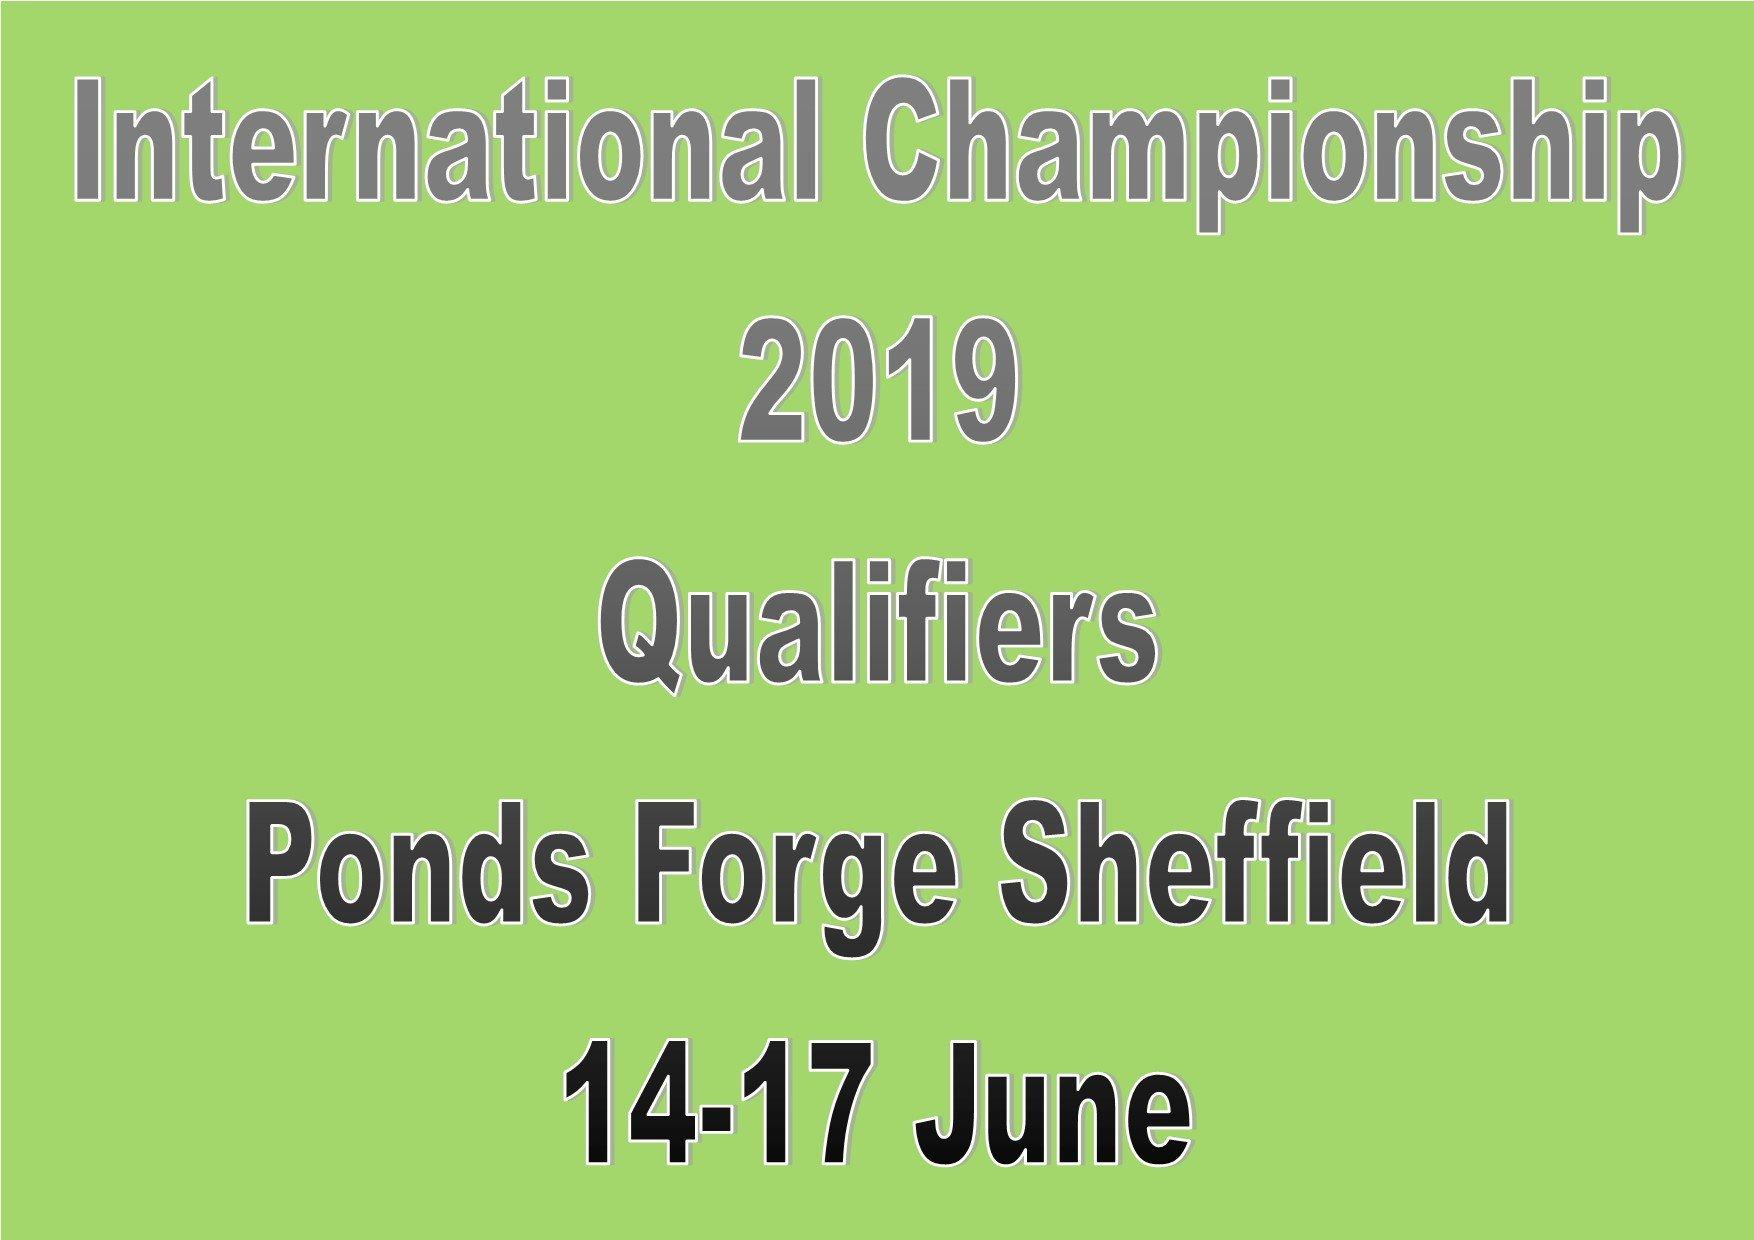 International Championship 2019 Qualifiers